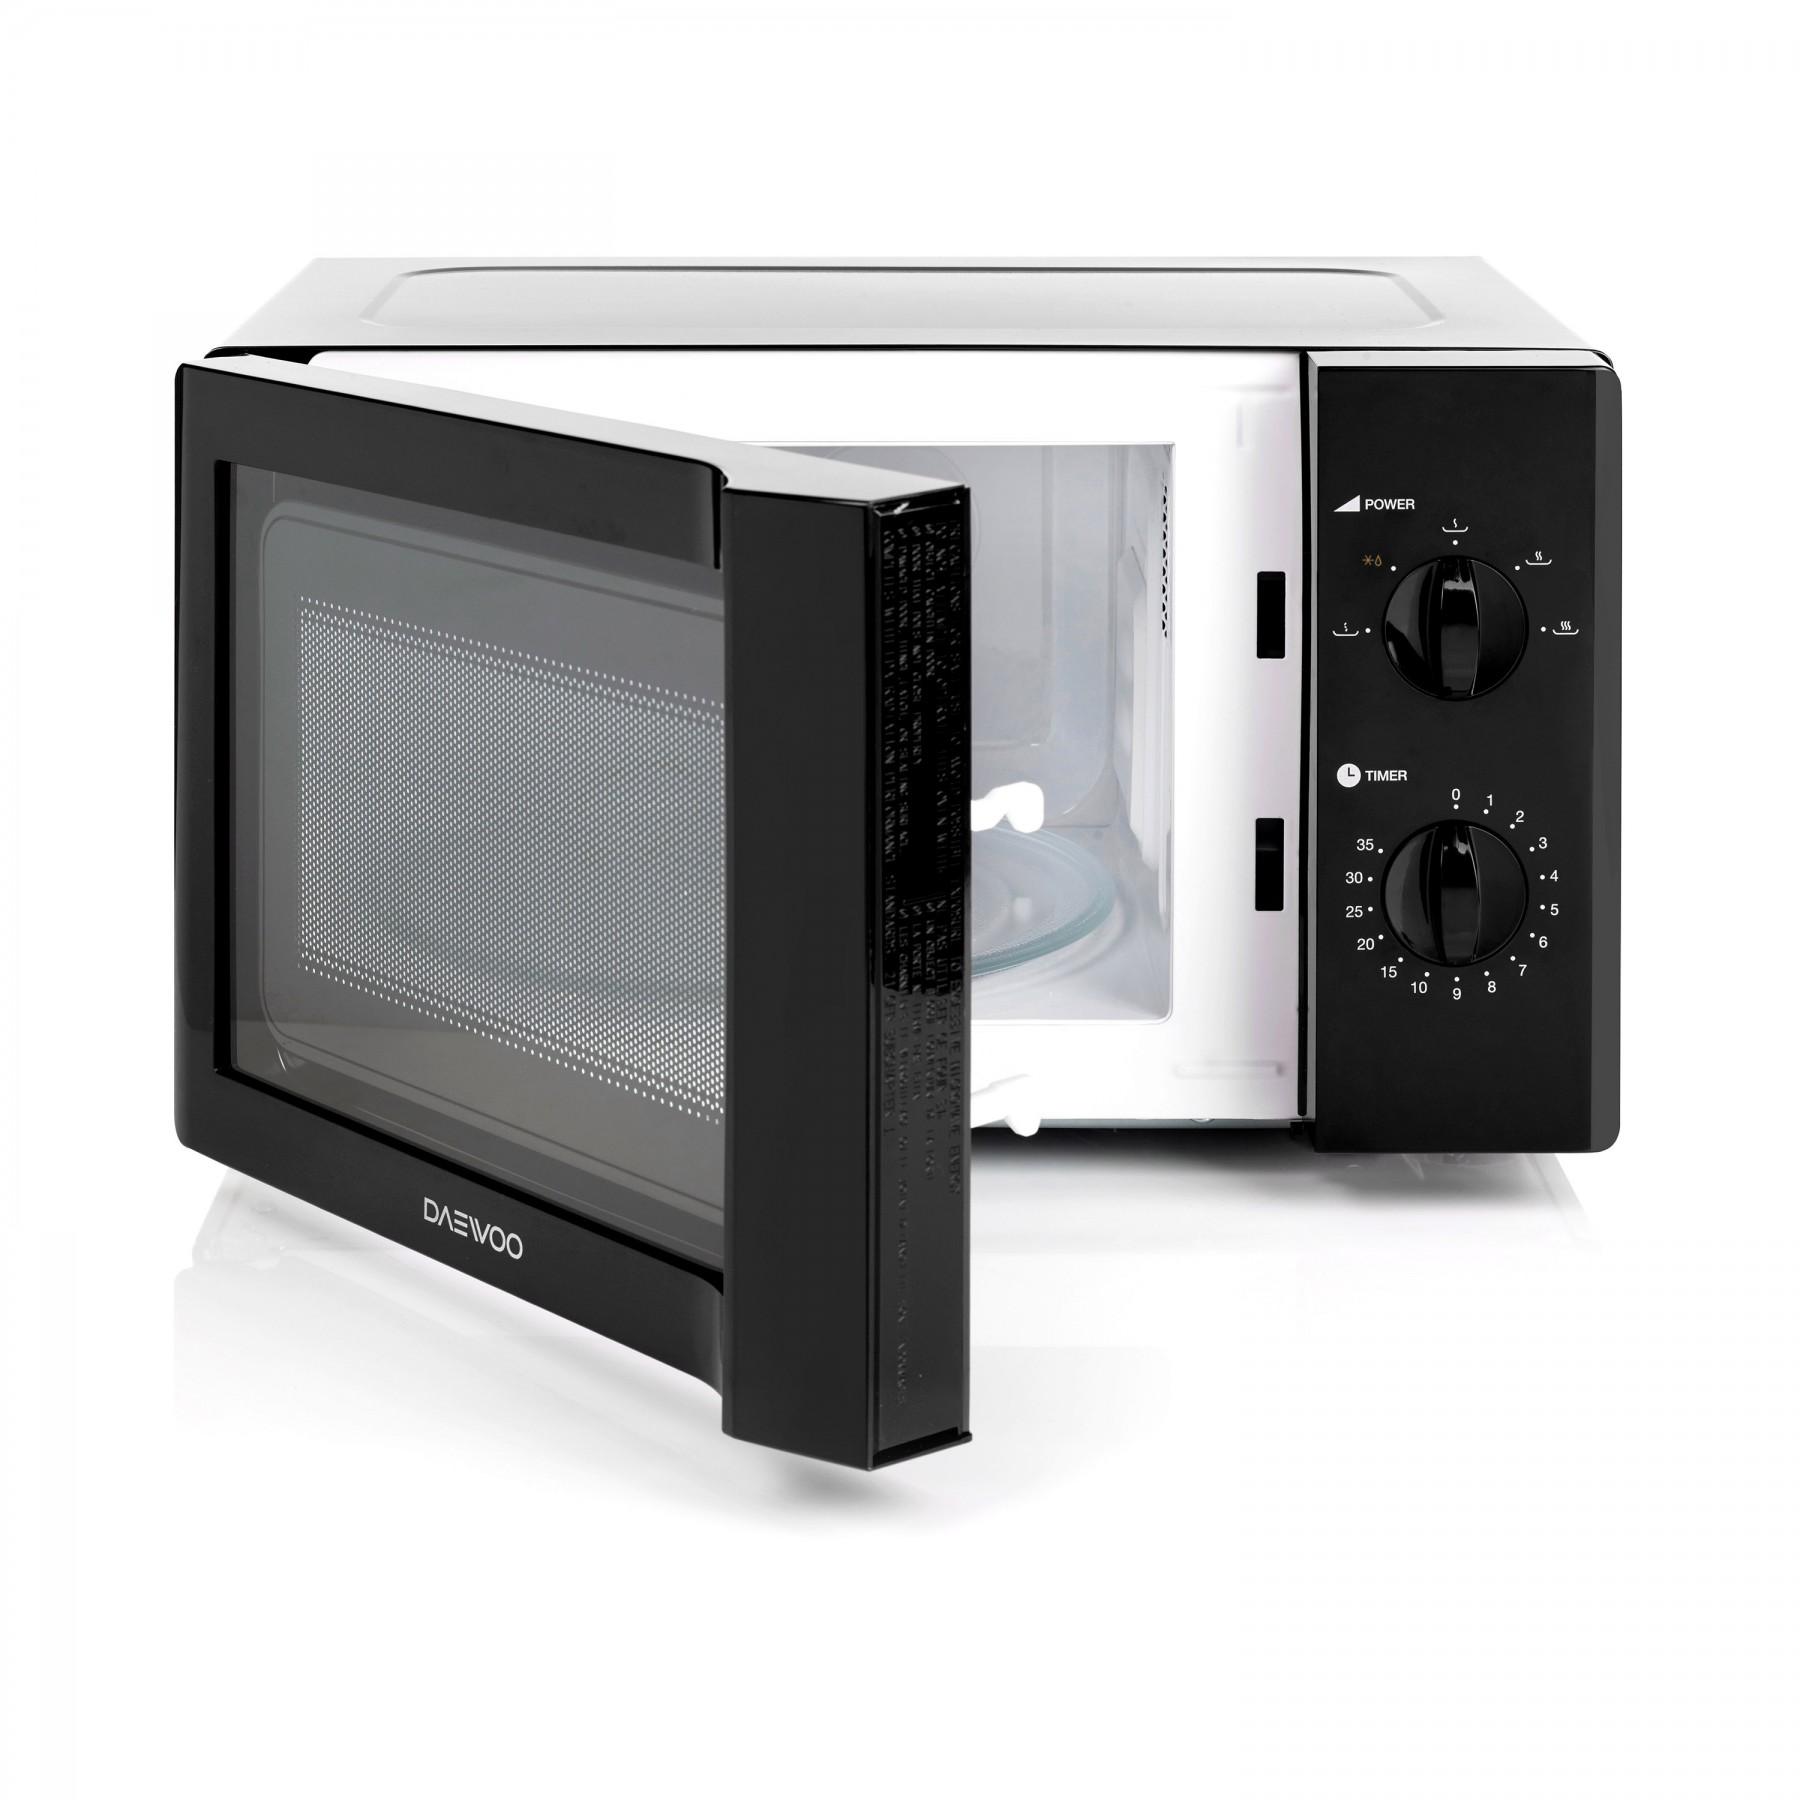 Kor 6l65b Mechanical Microwave Oven 20l Daewoo Electronics